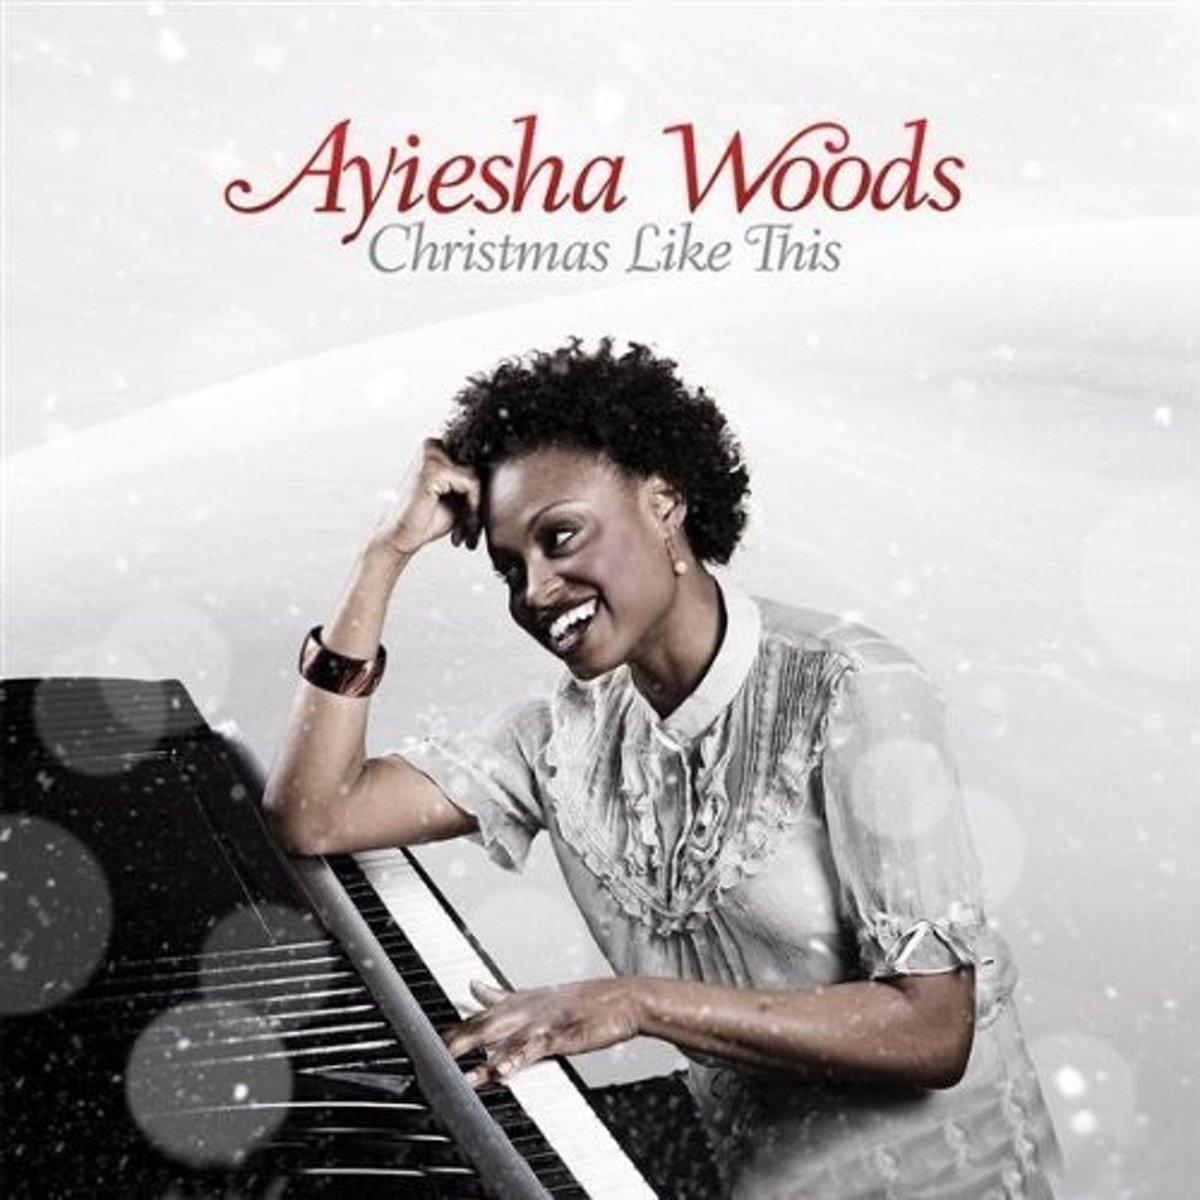 bol.com | Christmas Like This, Ayiesha Woods | CD (album) | Muziek